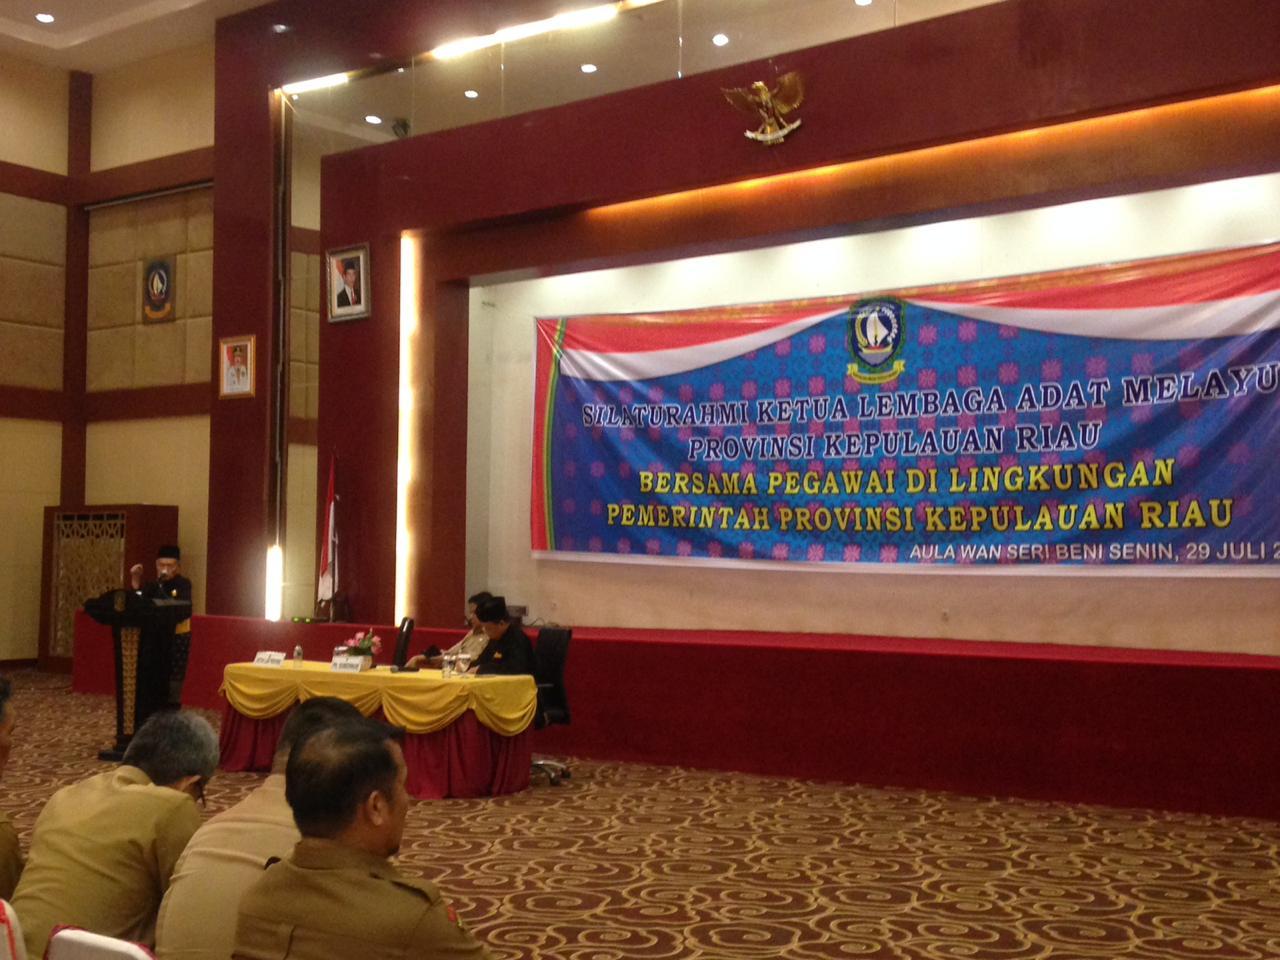 Oknum Pejabat Pemprov Digarap KPK, LAM Sindir Tercorengnya Marwah Melayu